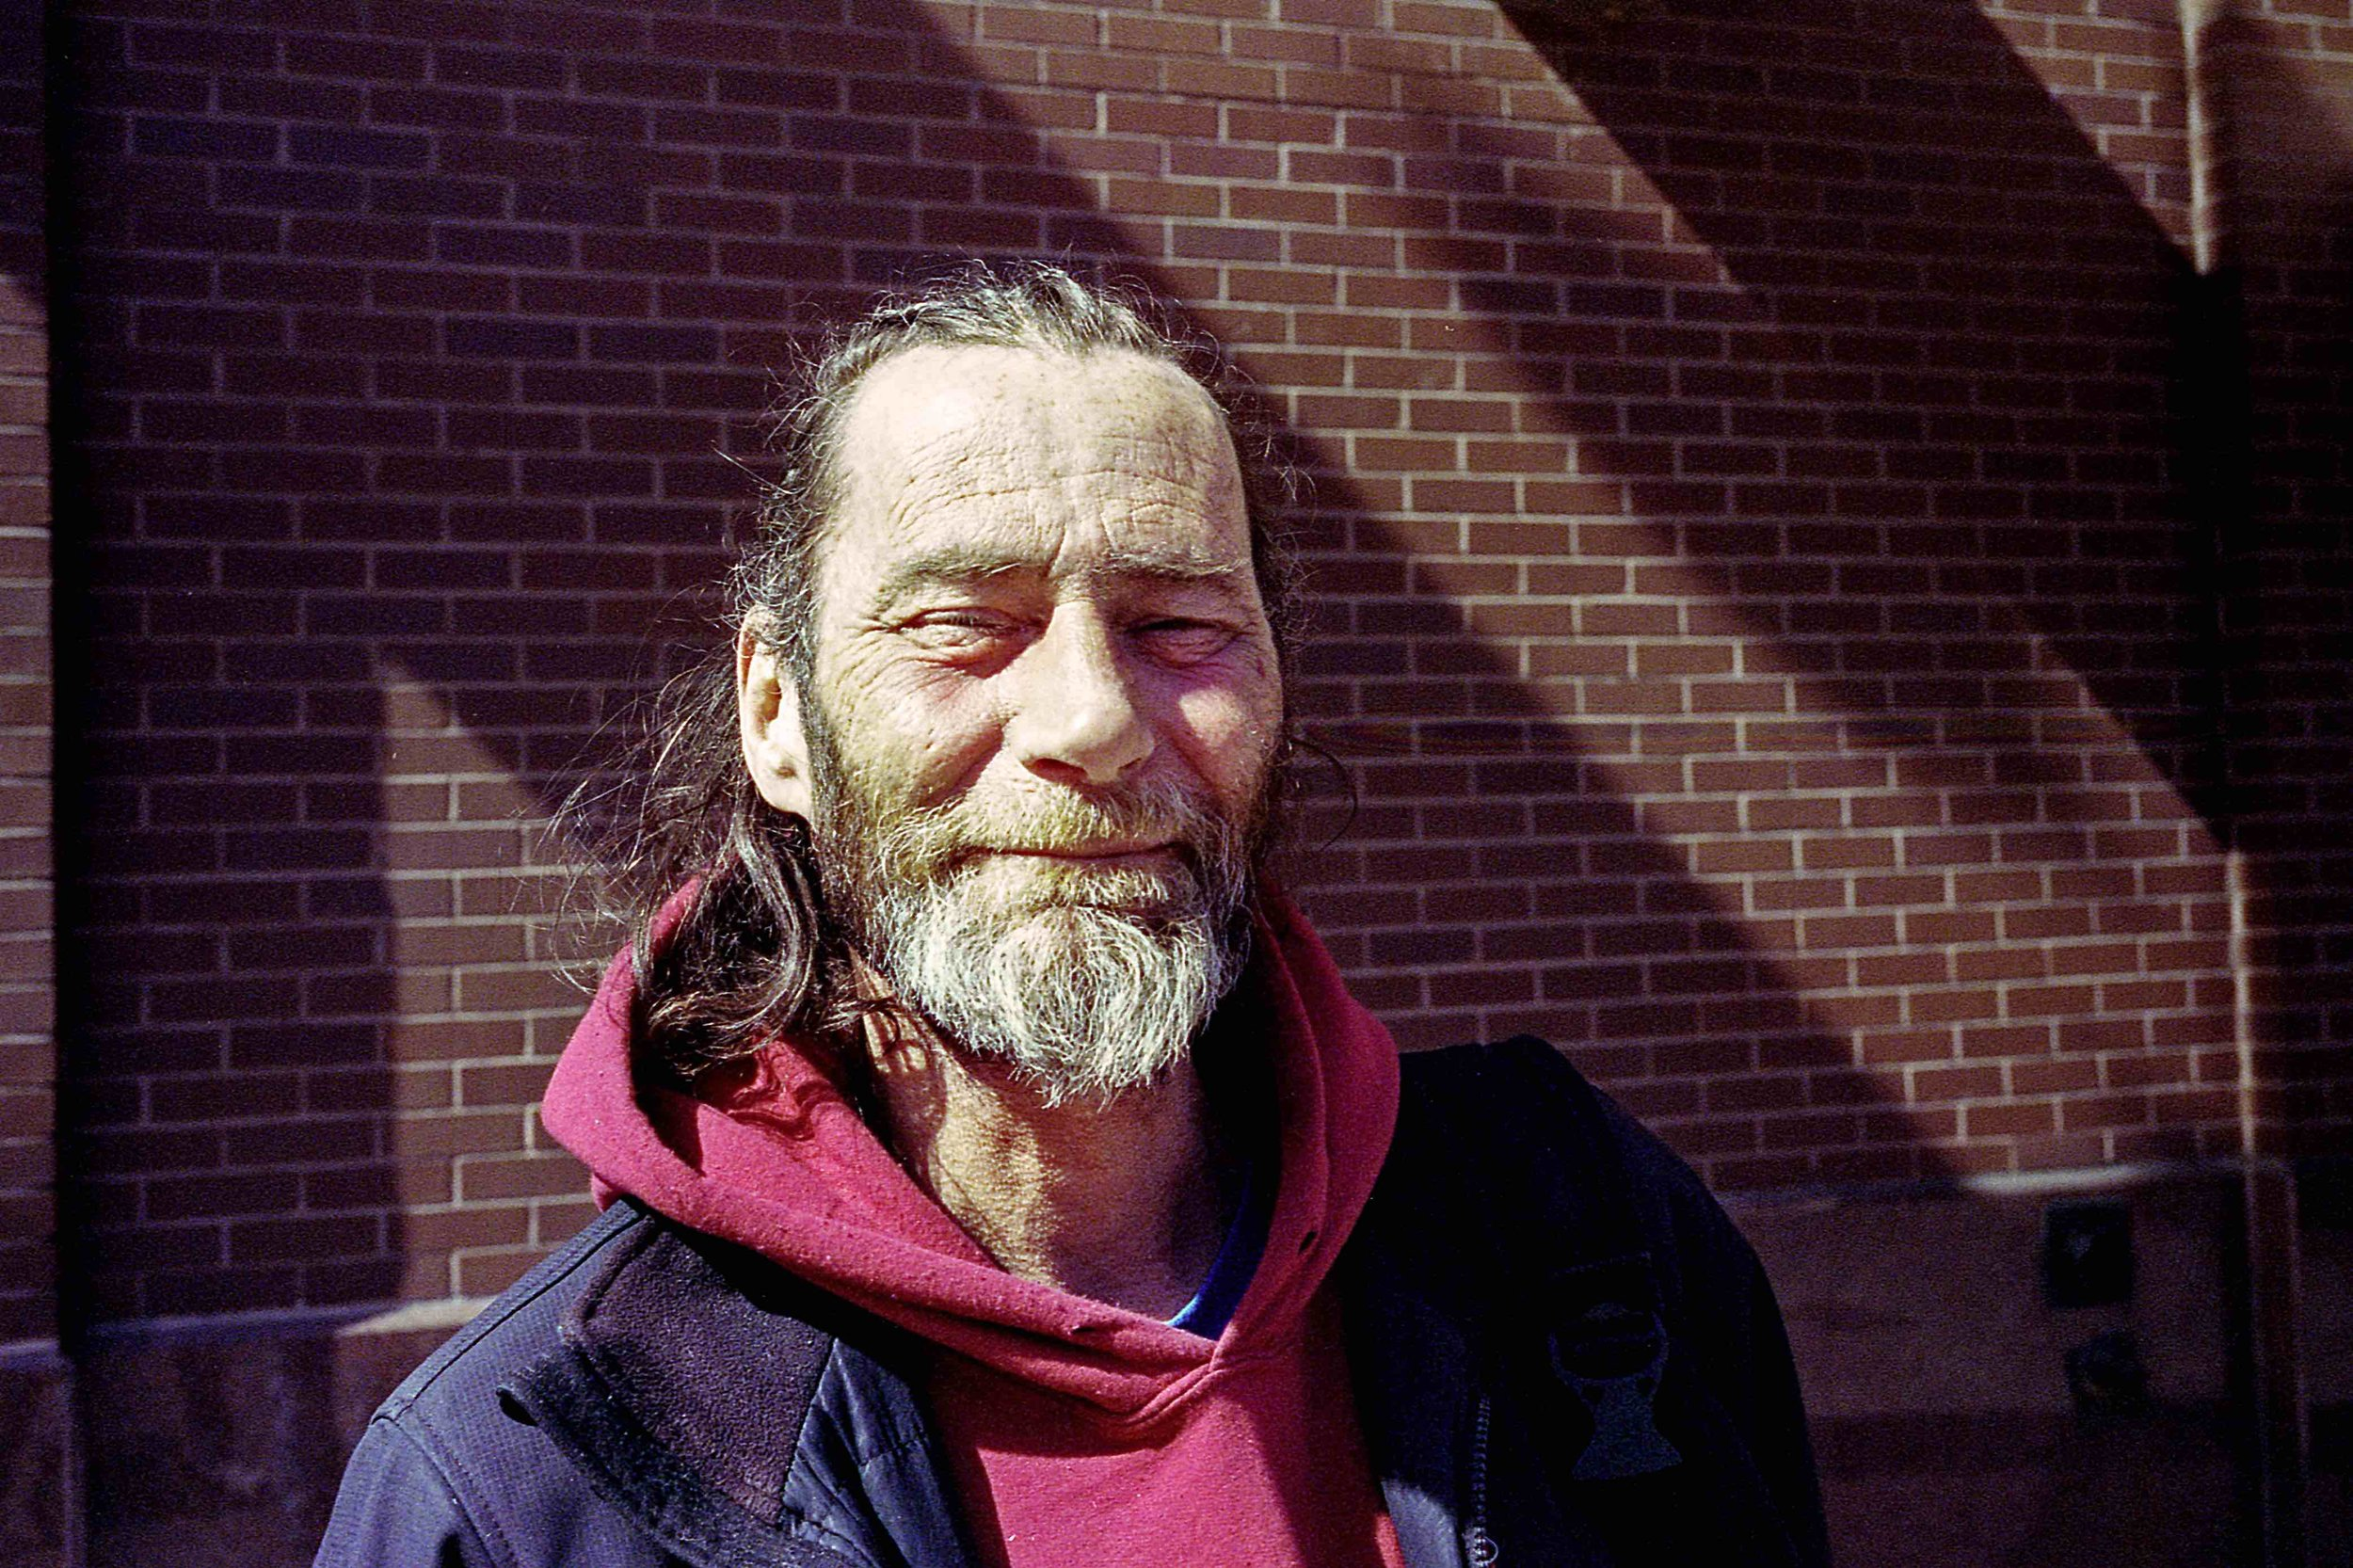 Matt Pittman / Chattanooga, TN / Kodak Portra 400 / Leica M7 / Street Photography